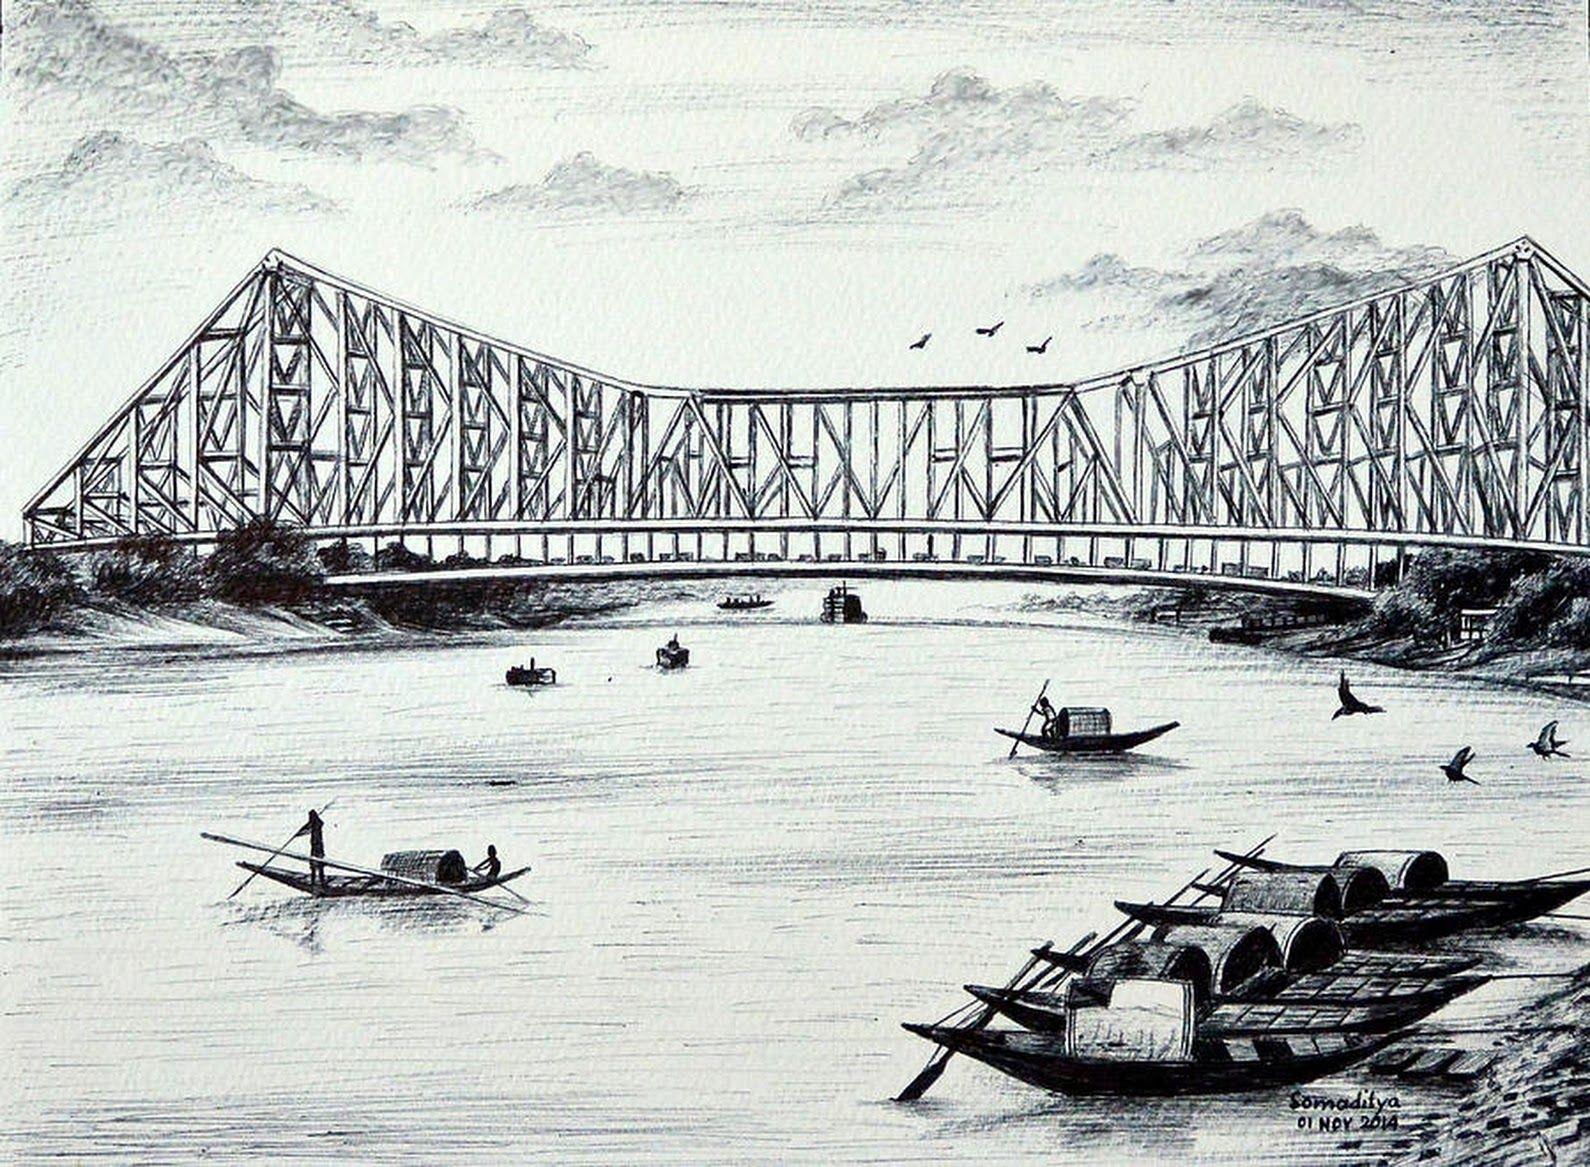 Howrah bridge kolkata by somaditya das ramkrishna